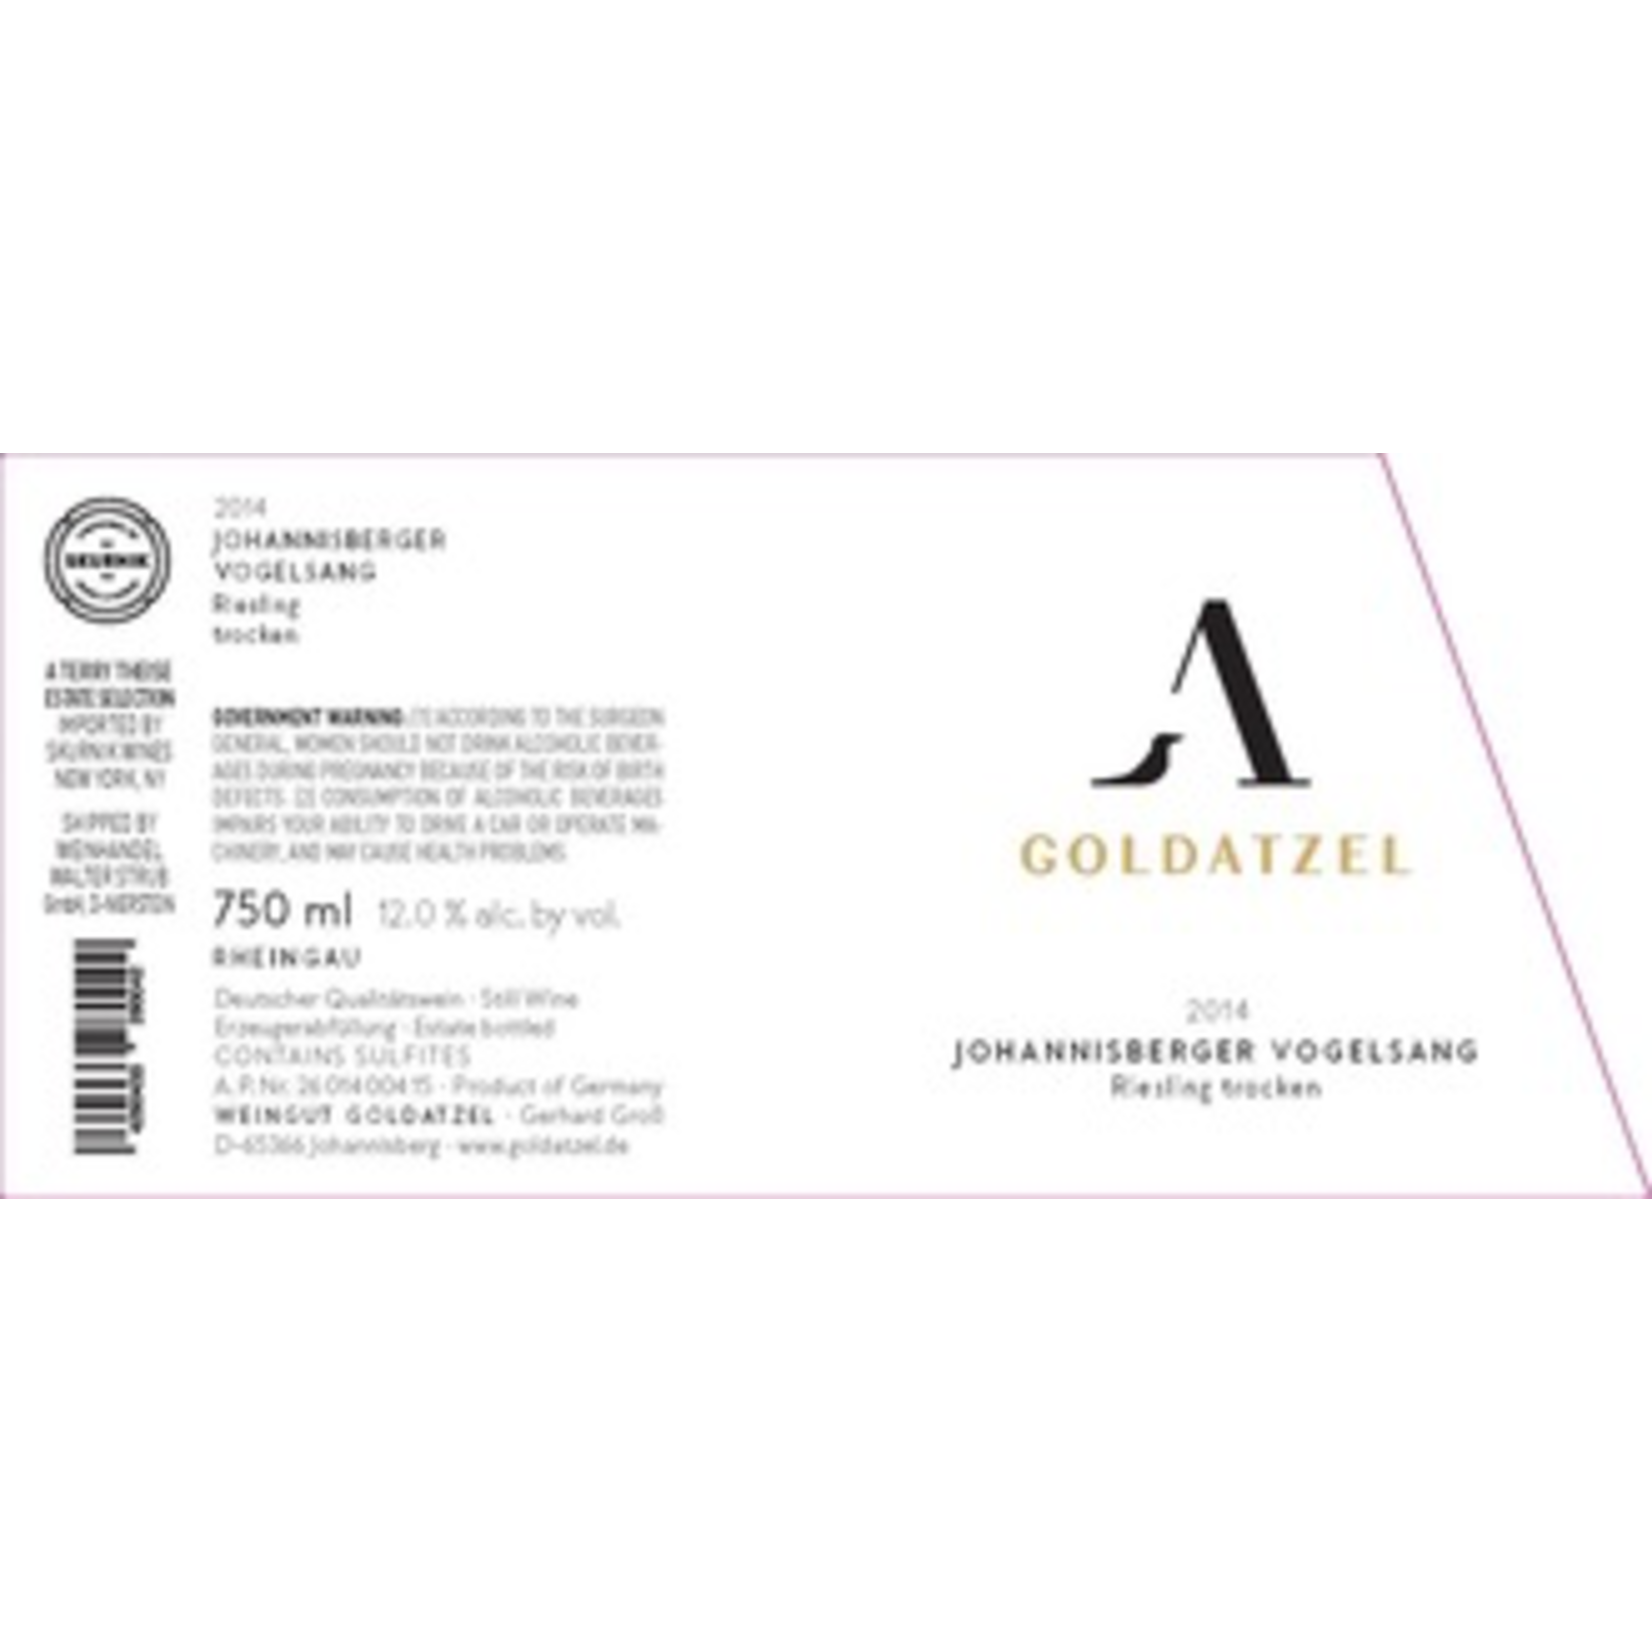 Goldatzel, Riesling Johannisberger Vogelsang Trocken 2016